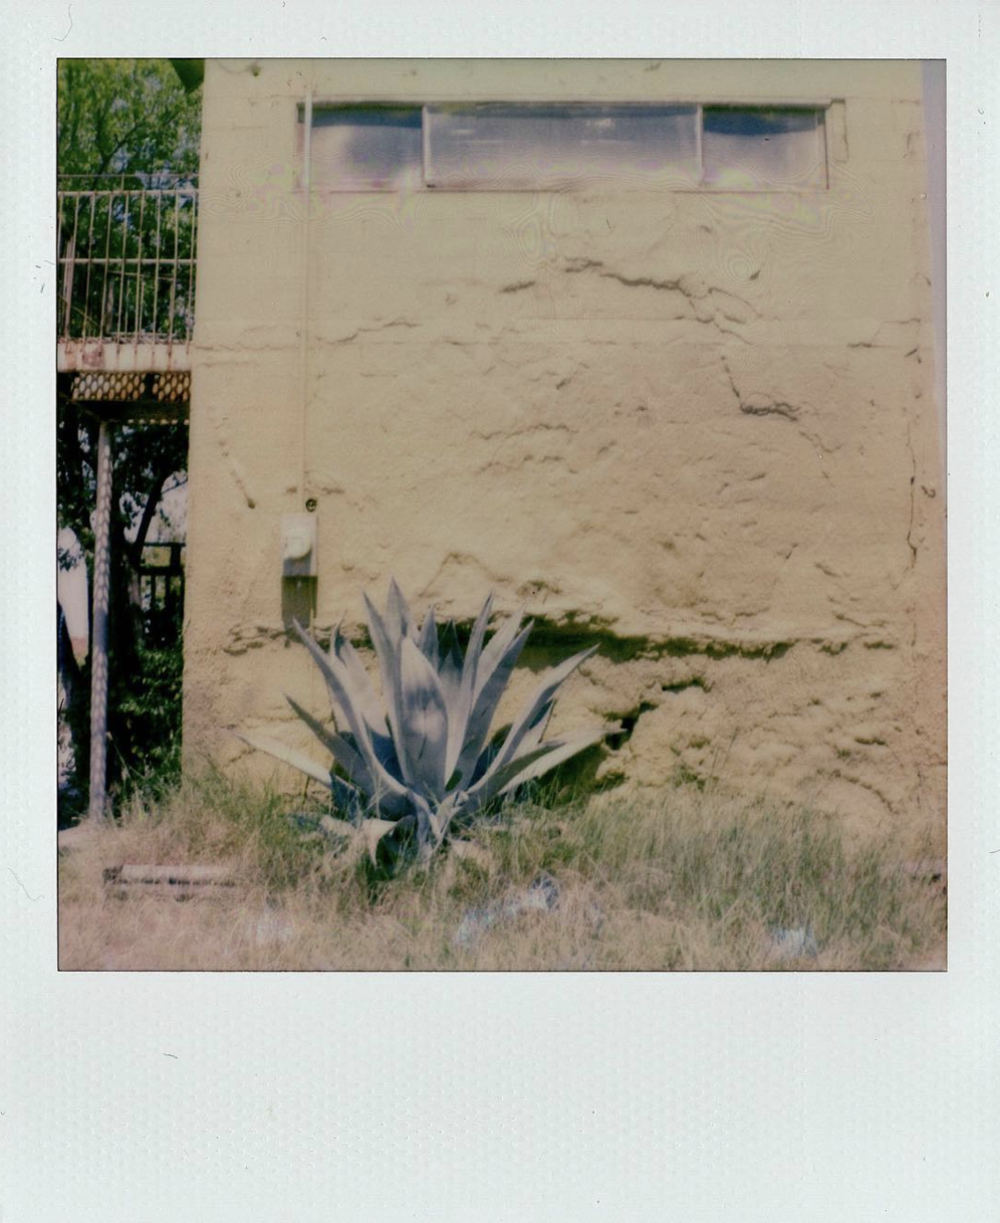 @instantdenton captured some agave on film.